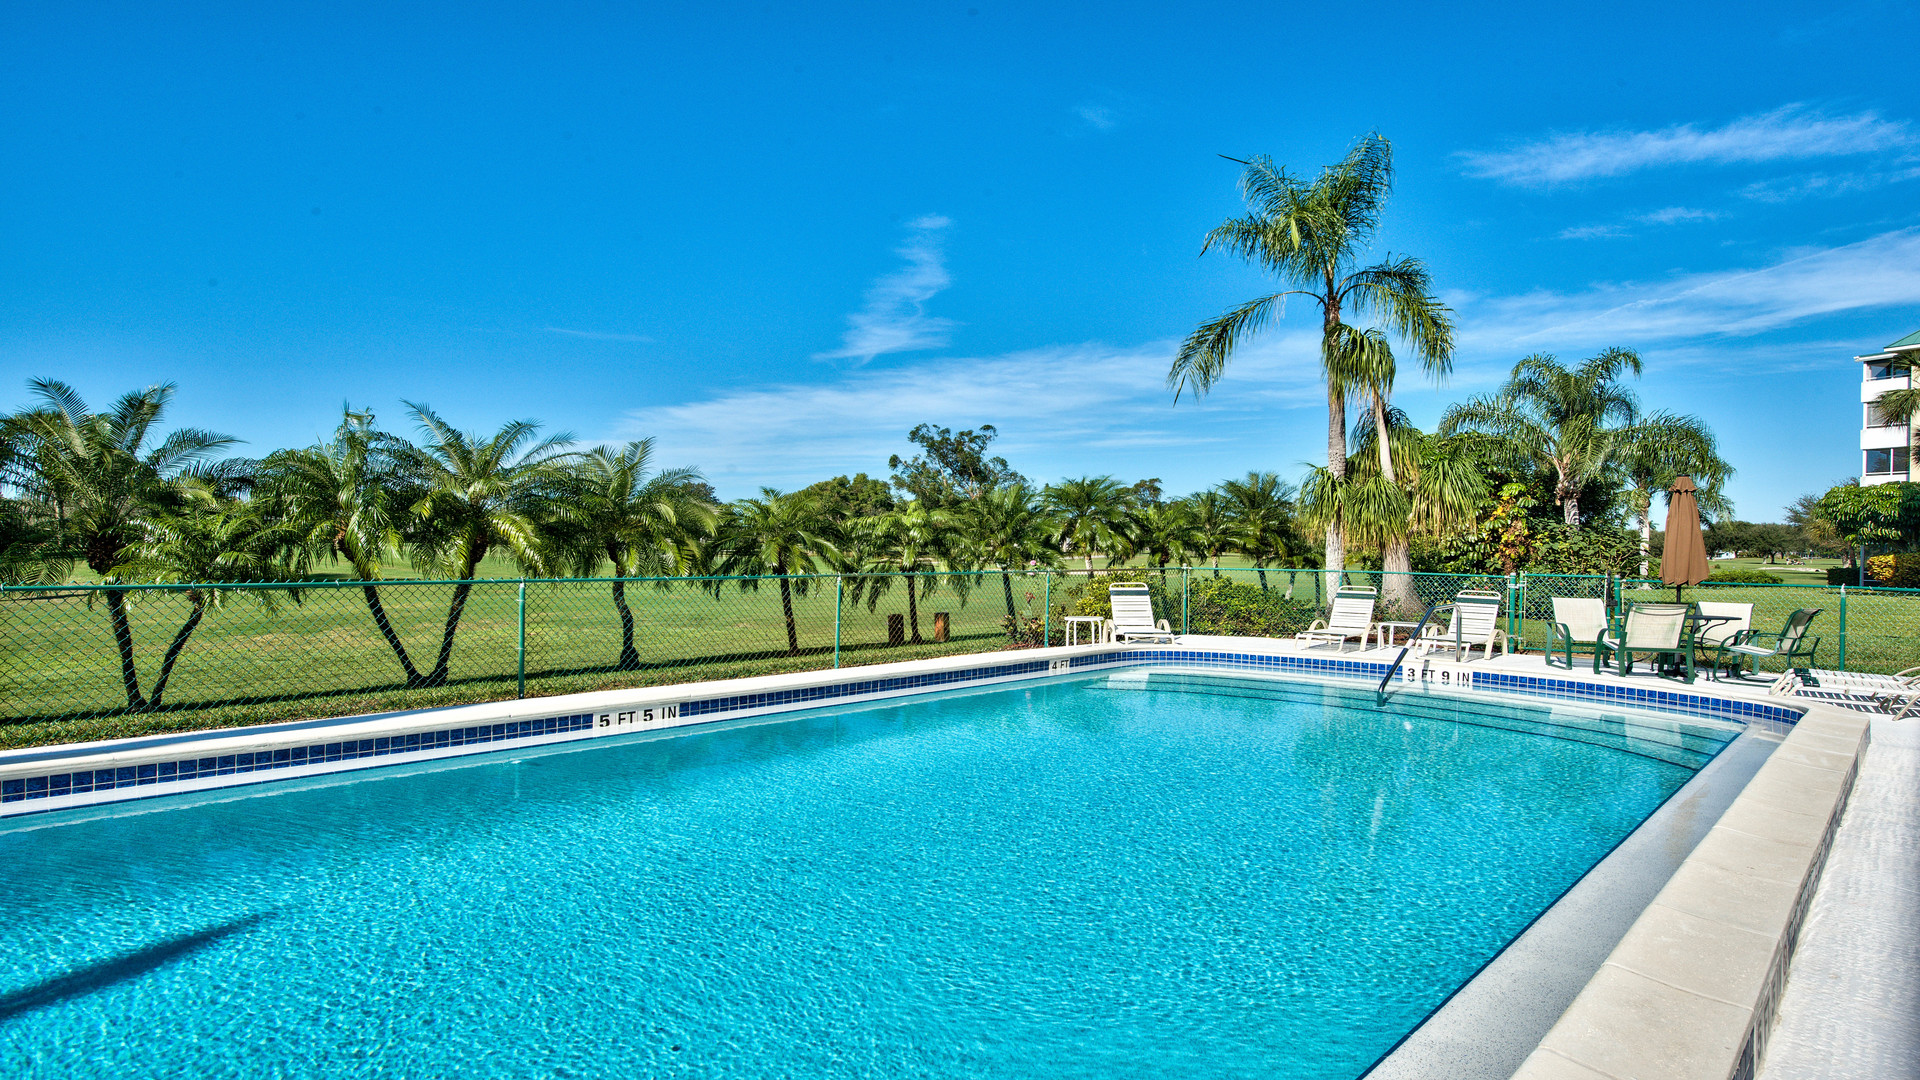 Naples Florida Vacation Homes Capri Golf Condo in Hibiscus Golf